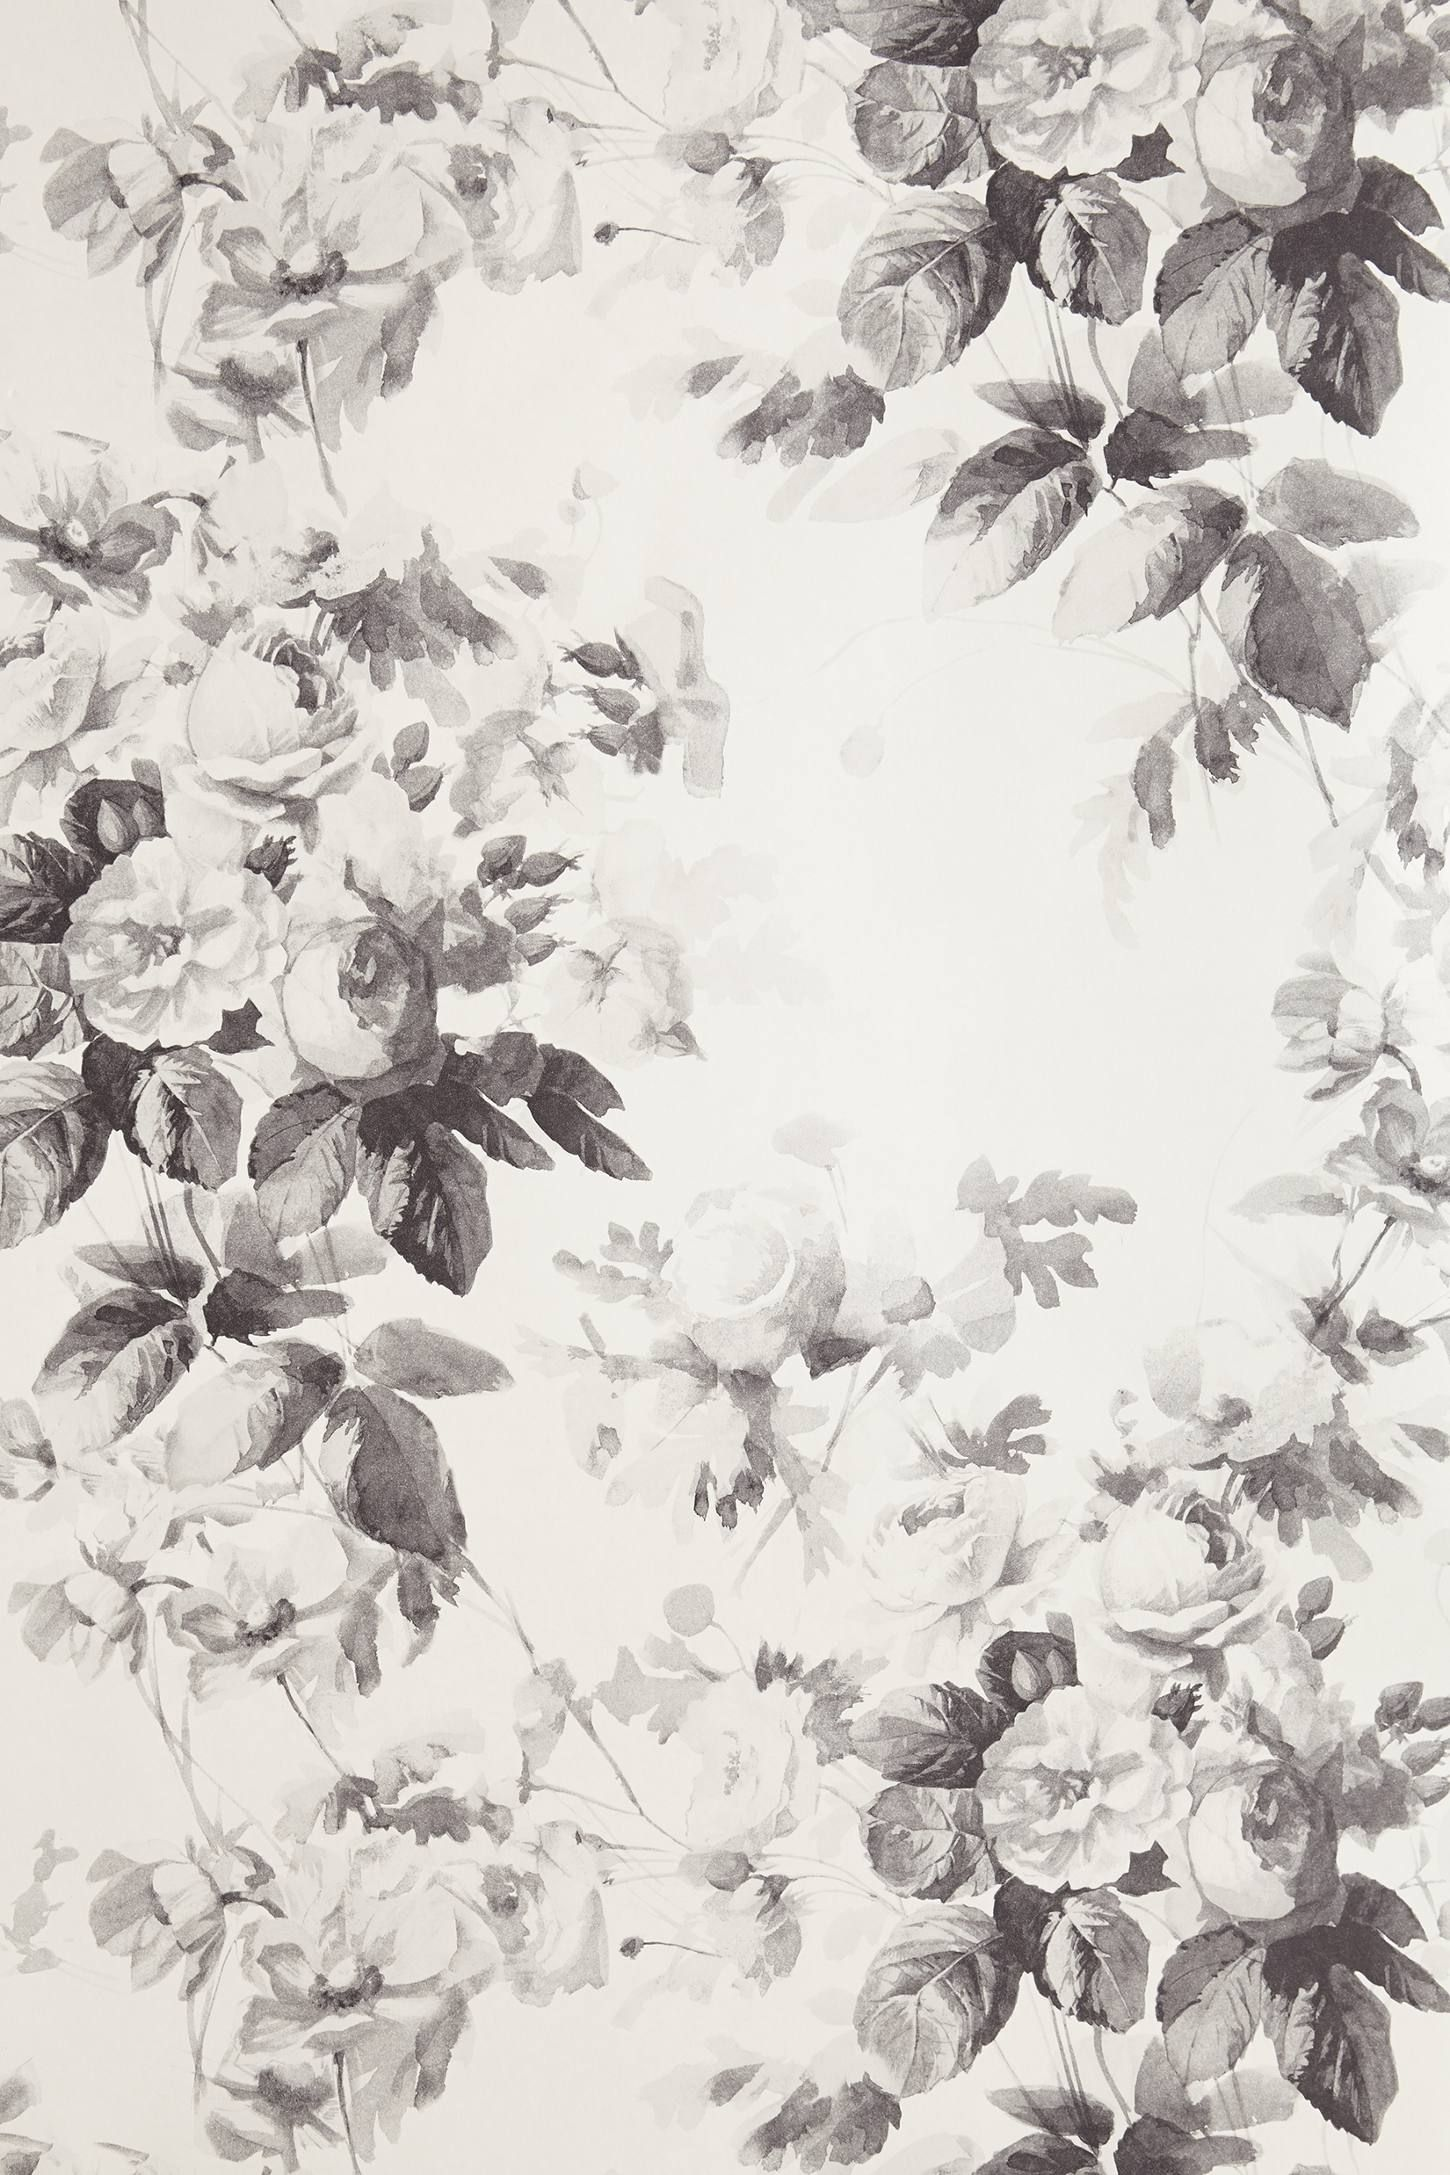 black/white/gray Smoky Rose Wallpaper - http://bit.ly/ZxnW1M